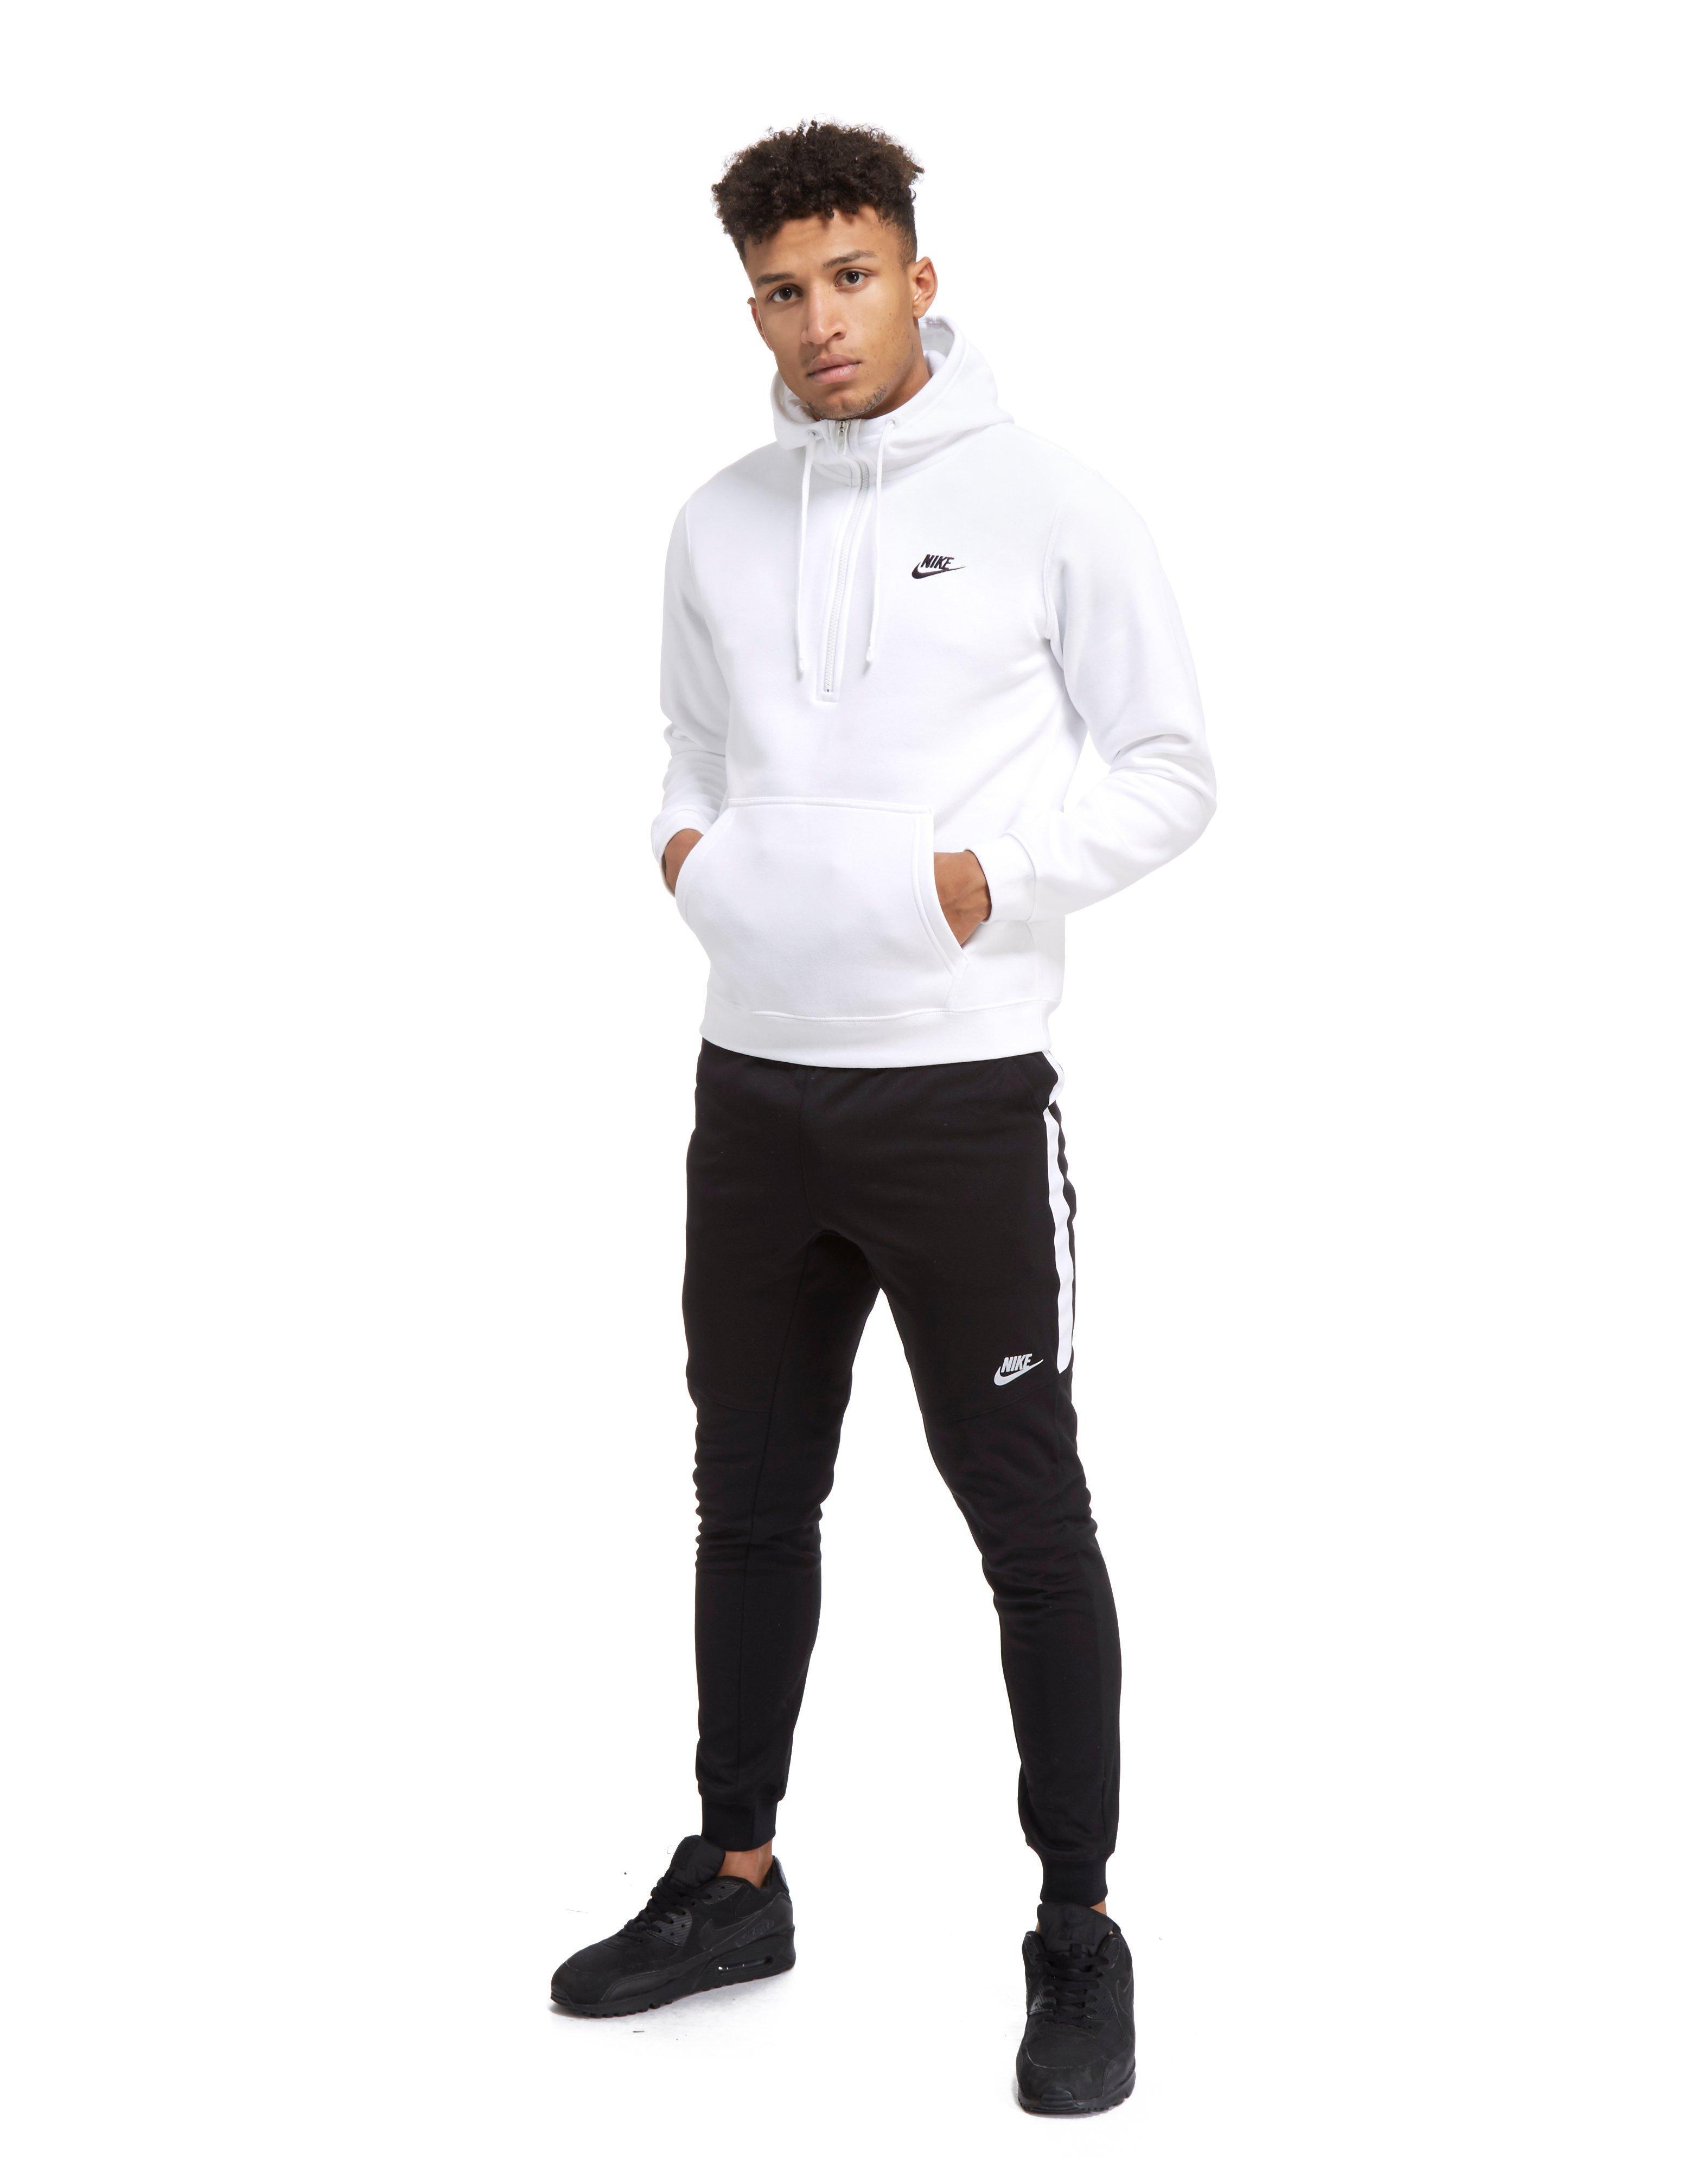 354d9f24 Nike Tribute Dc Pants in Black for Men - Lyst